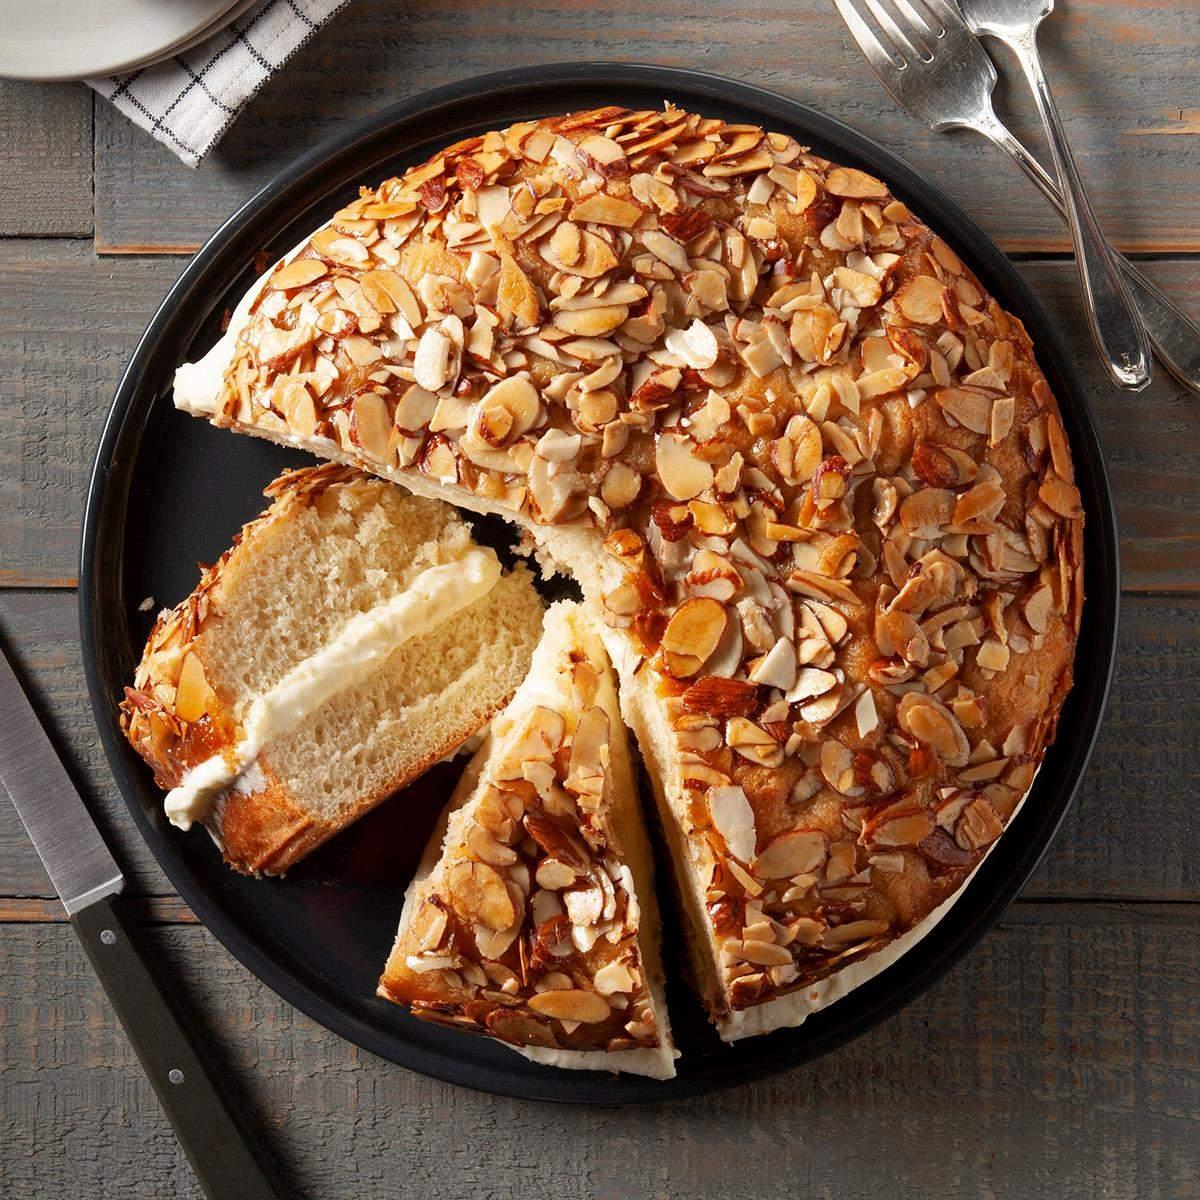 Receta de pastel de picadura de abeja | Sabor de casa